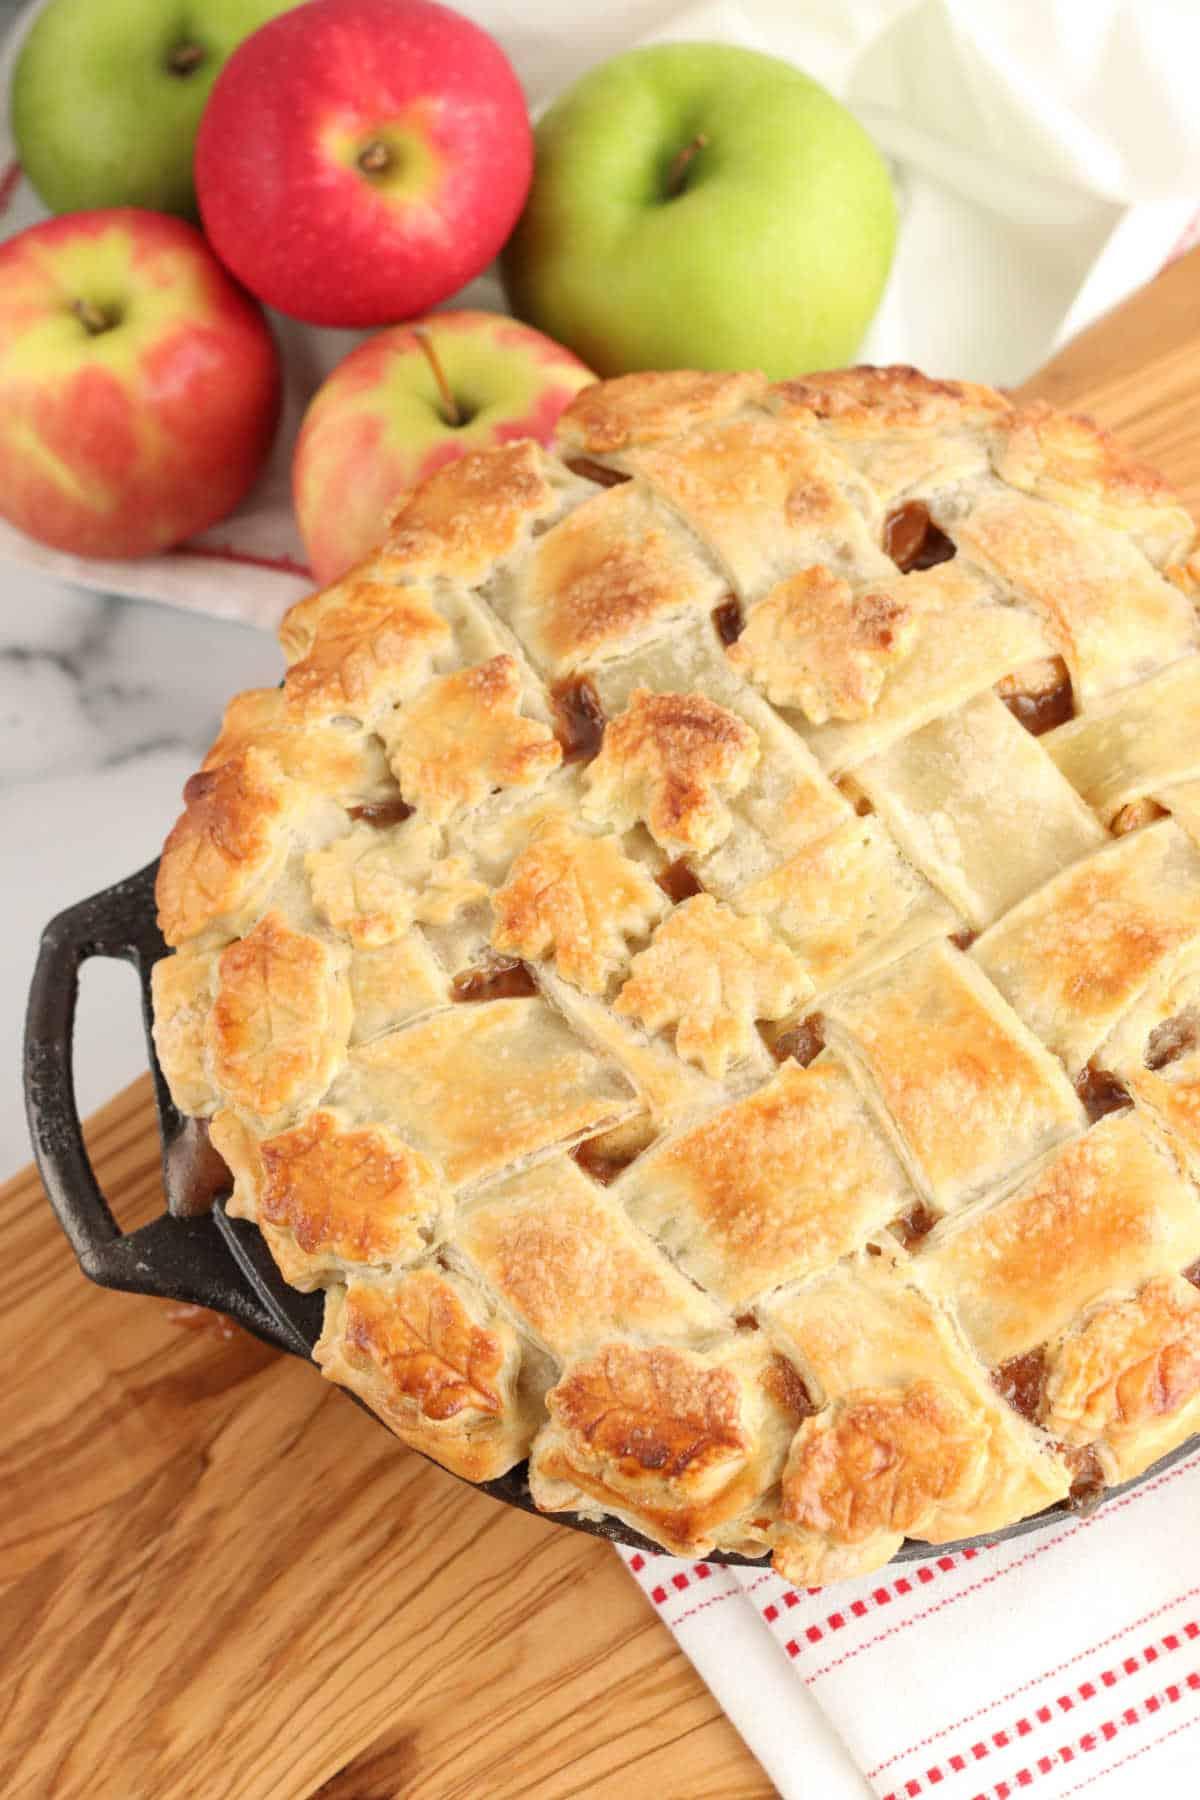 Close up of lattice pie crust on apple pie, apples in background.